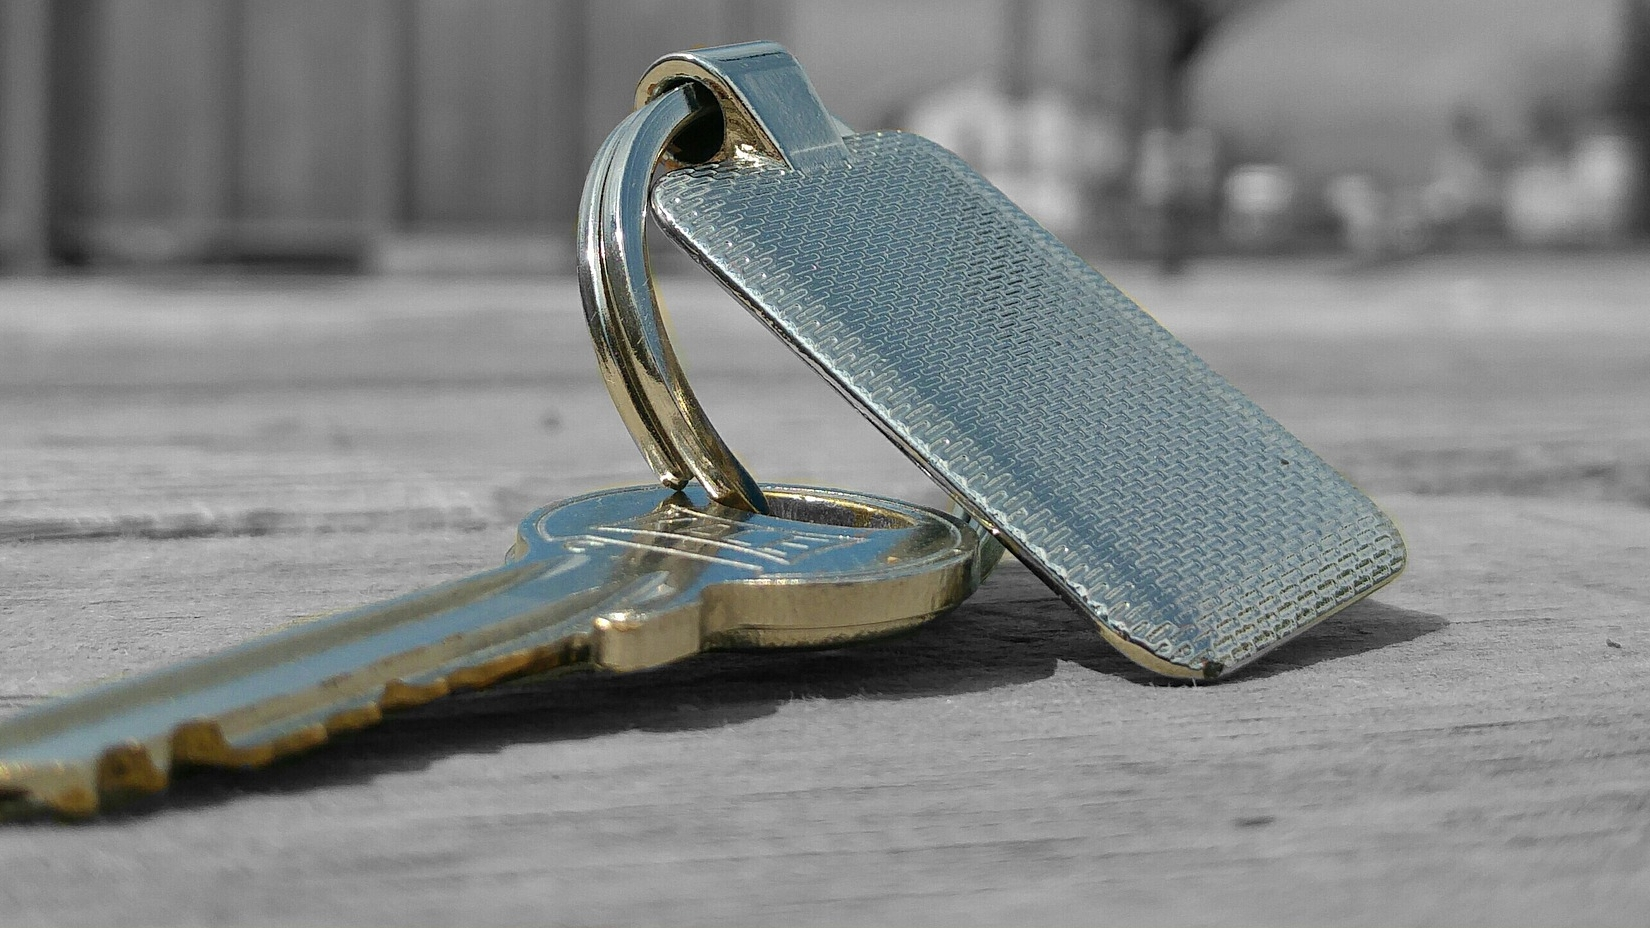 key-2501911_1920.jpg